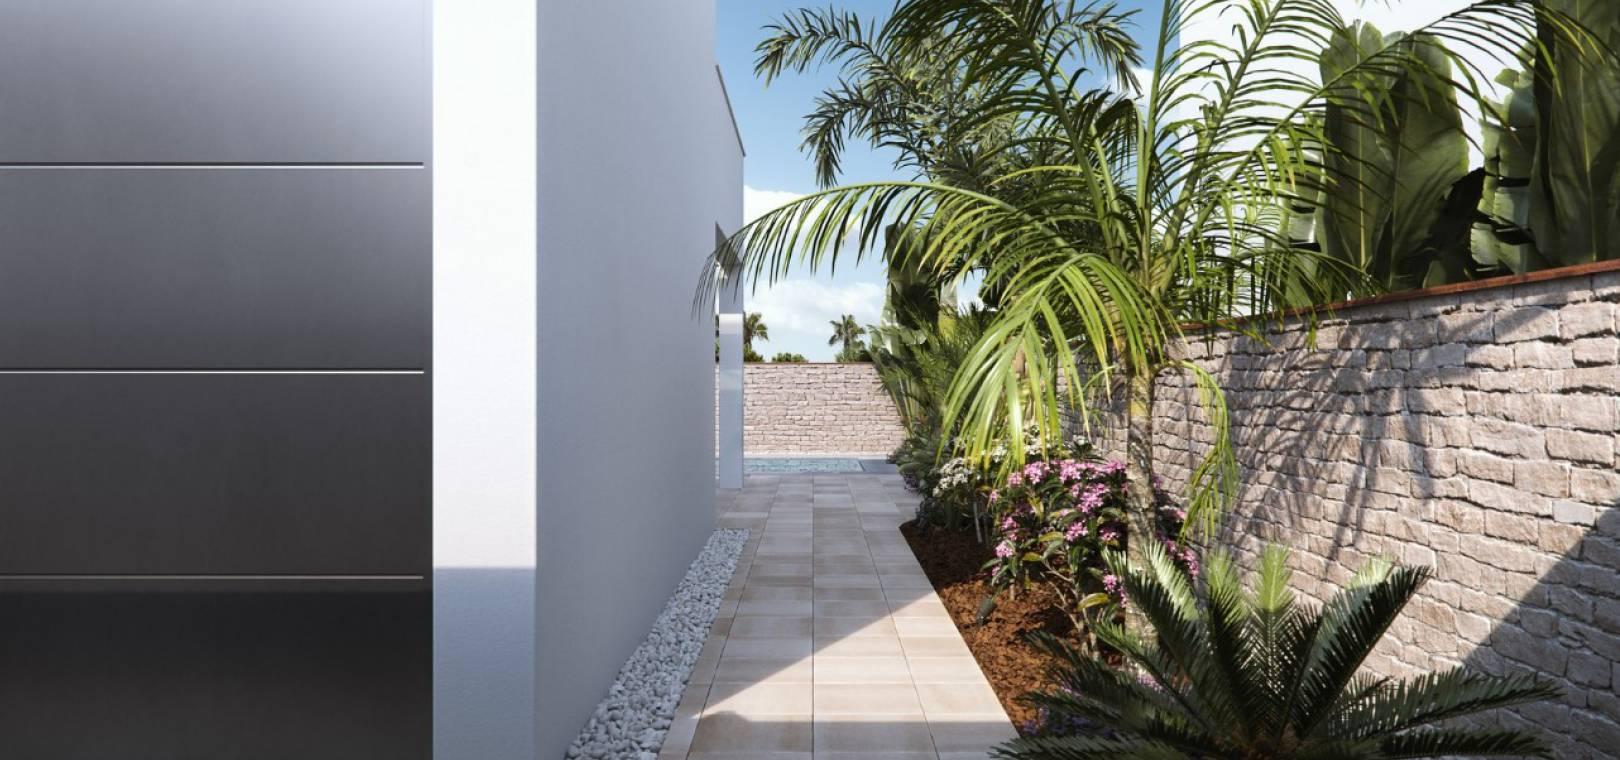 Torre_de_la_Horadada_New_Build_Luxury_Houses_For_Sale_nsp256_4